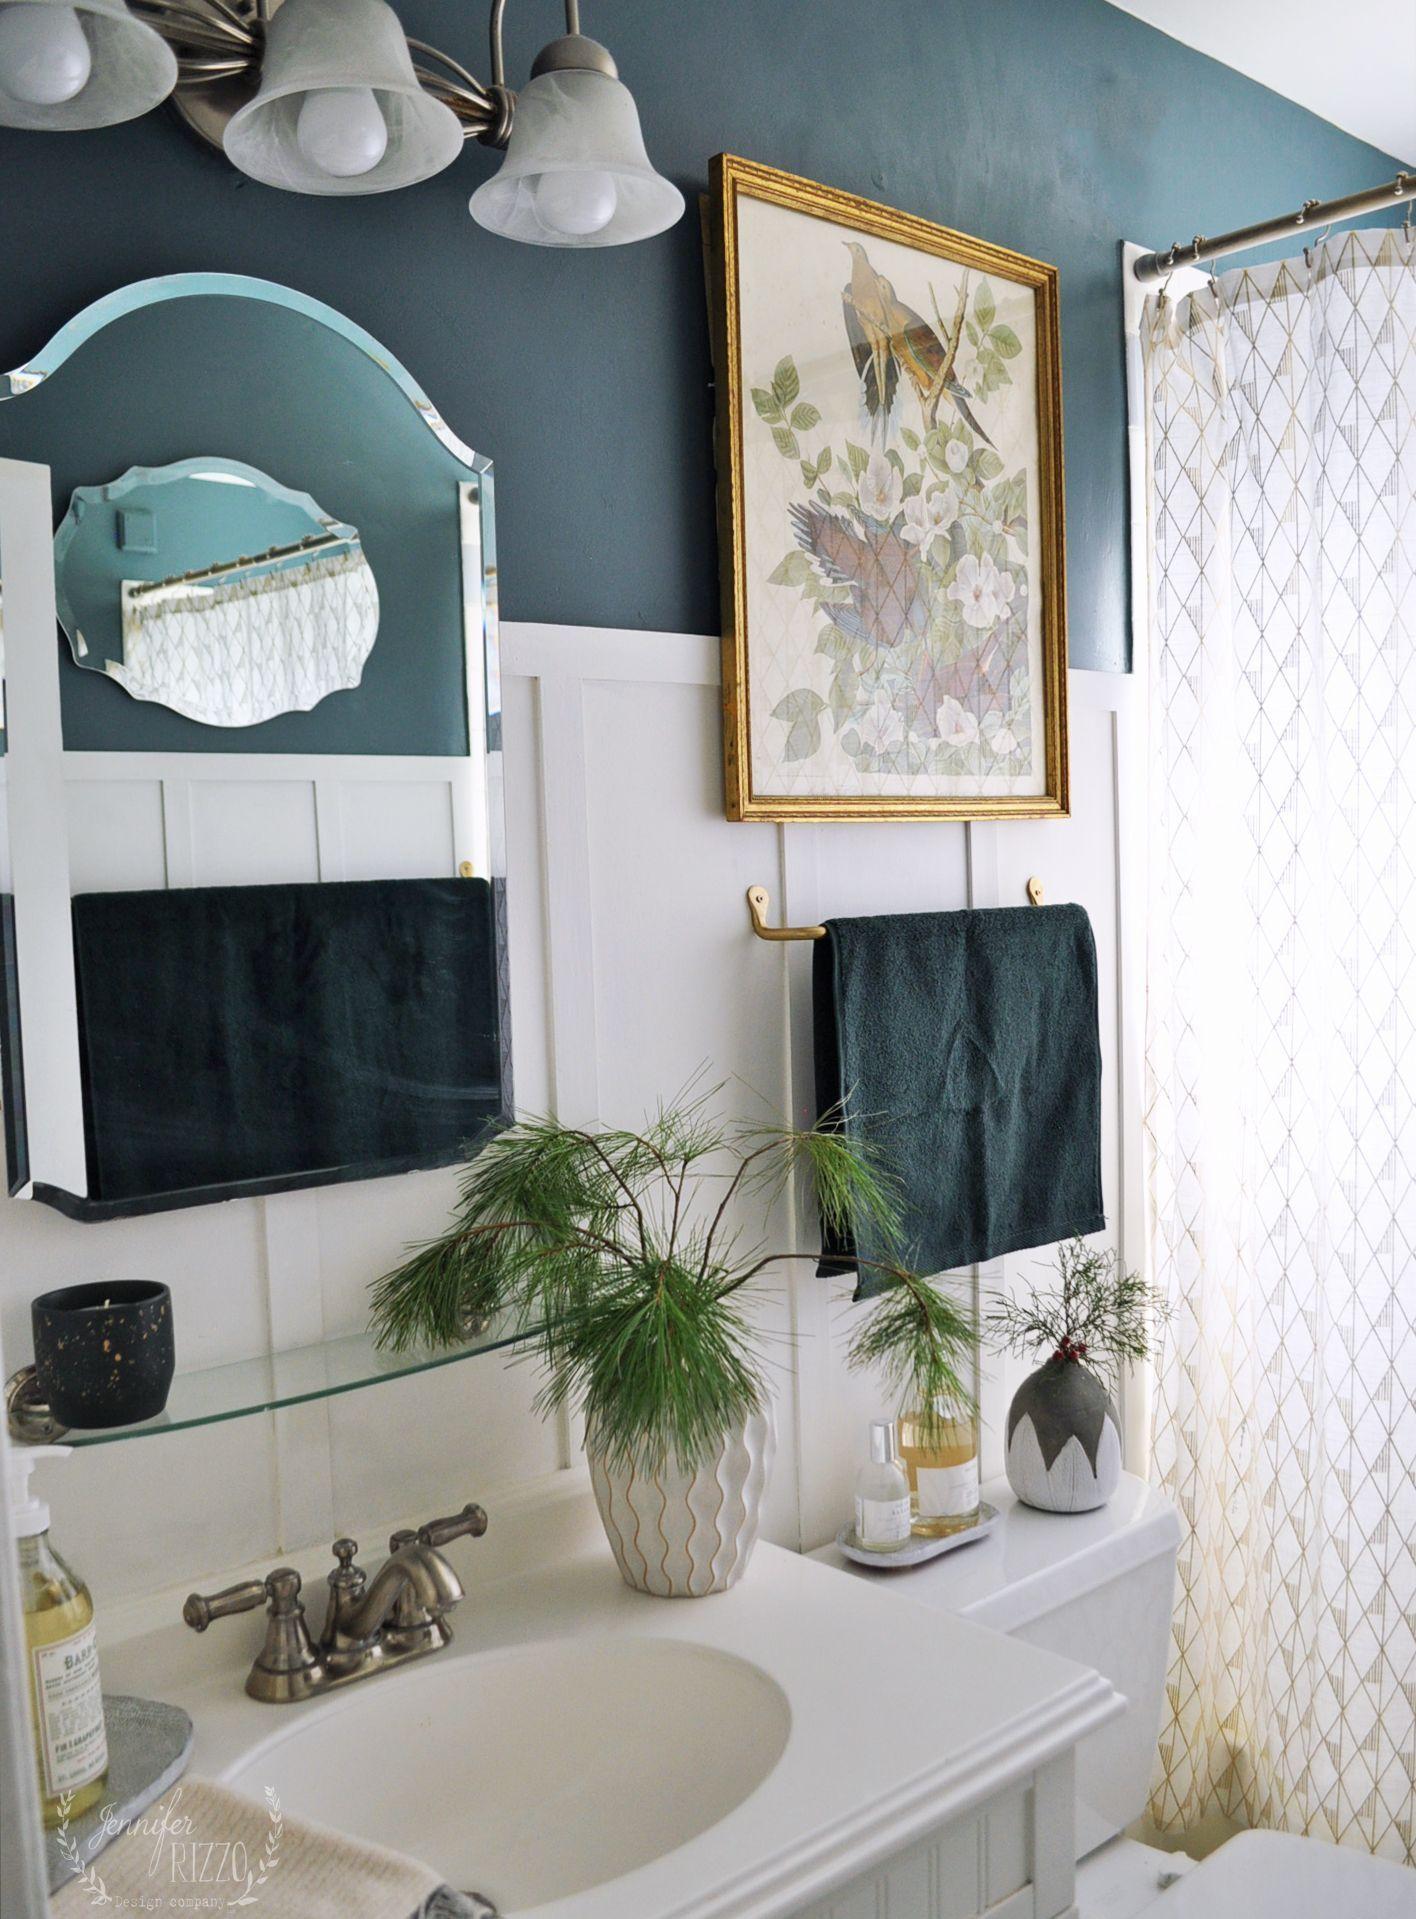 Dark Green Benjamin Moore Calico Blue Bathroom Paint Color For 2019 On Trend Paint Color In 2020 Dark Green Bathrooms Blue Bathroom Blue Bathroom Paint